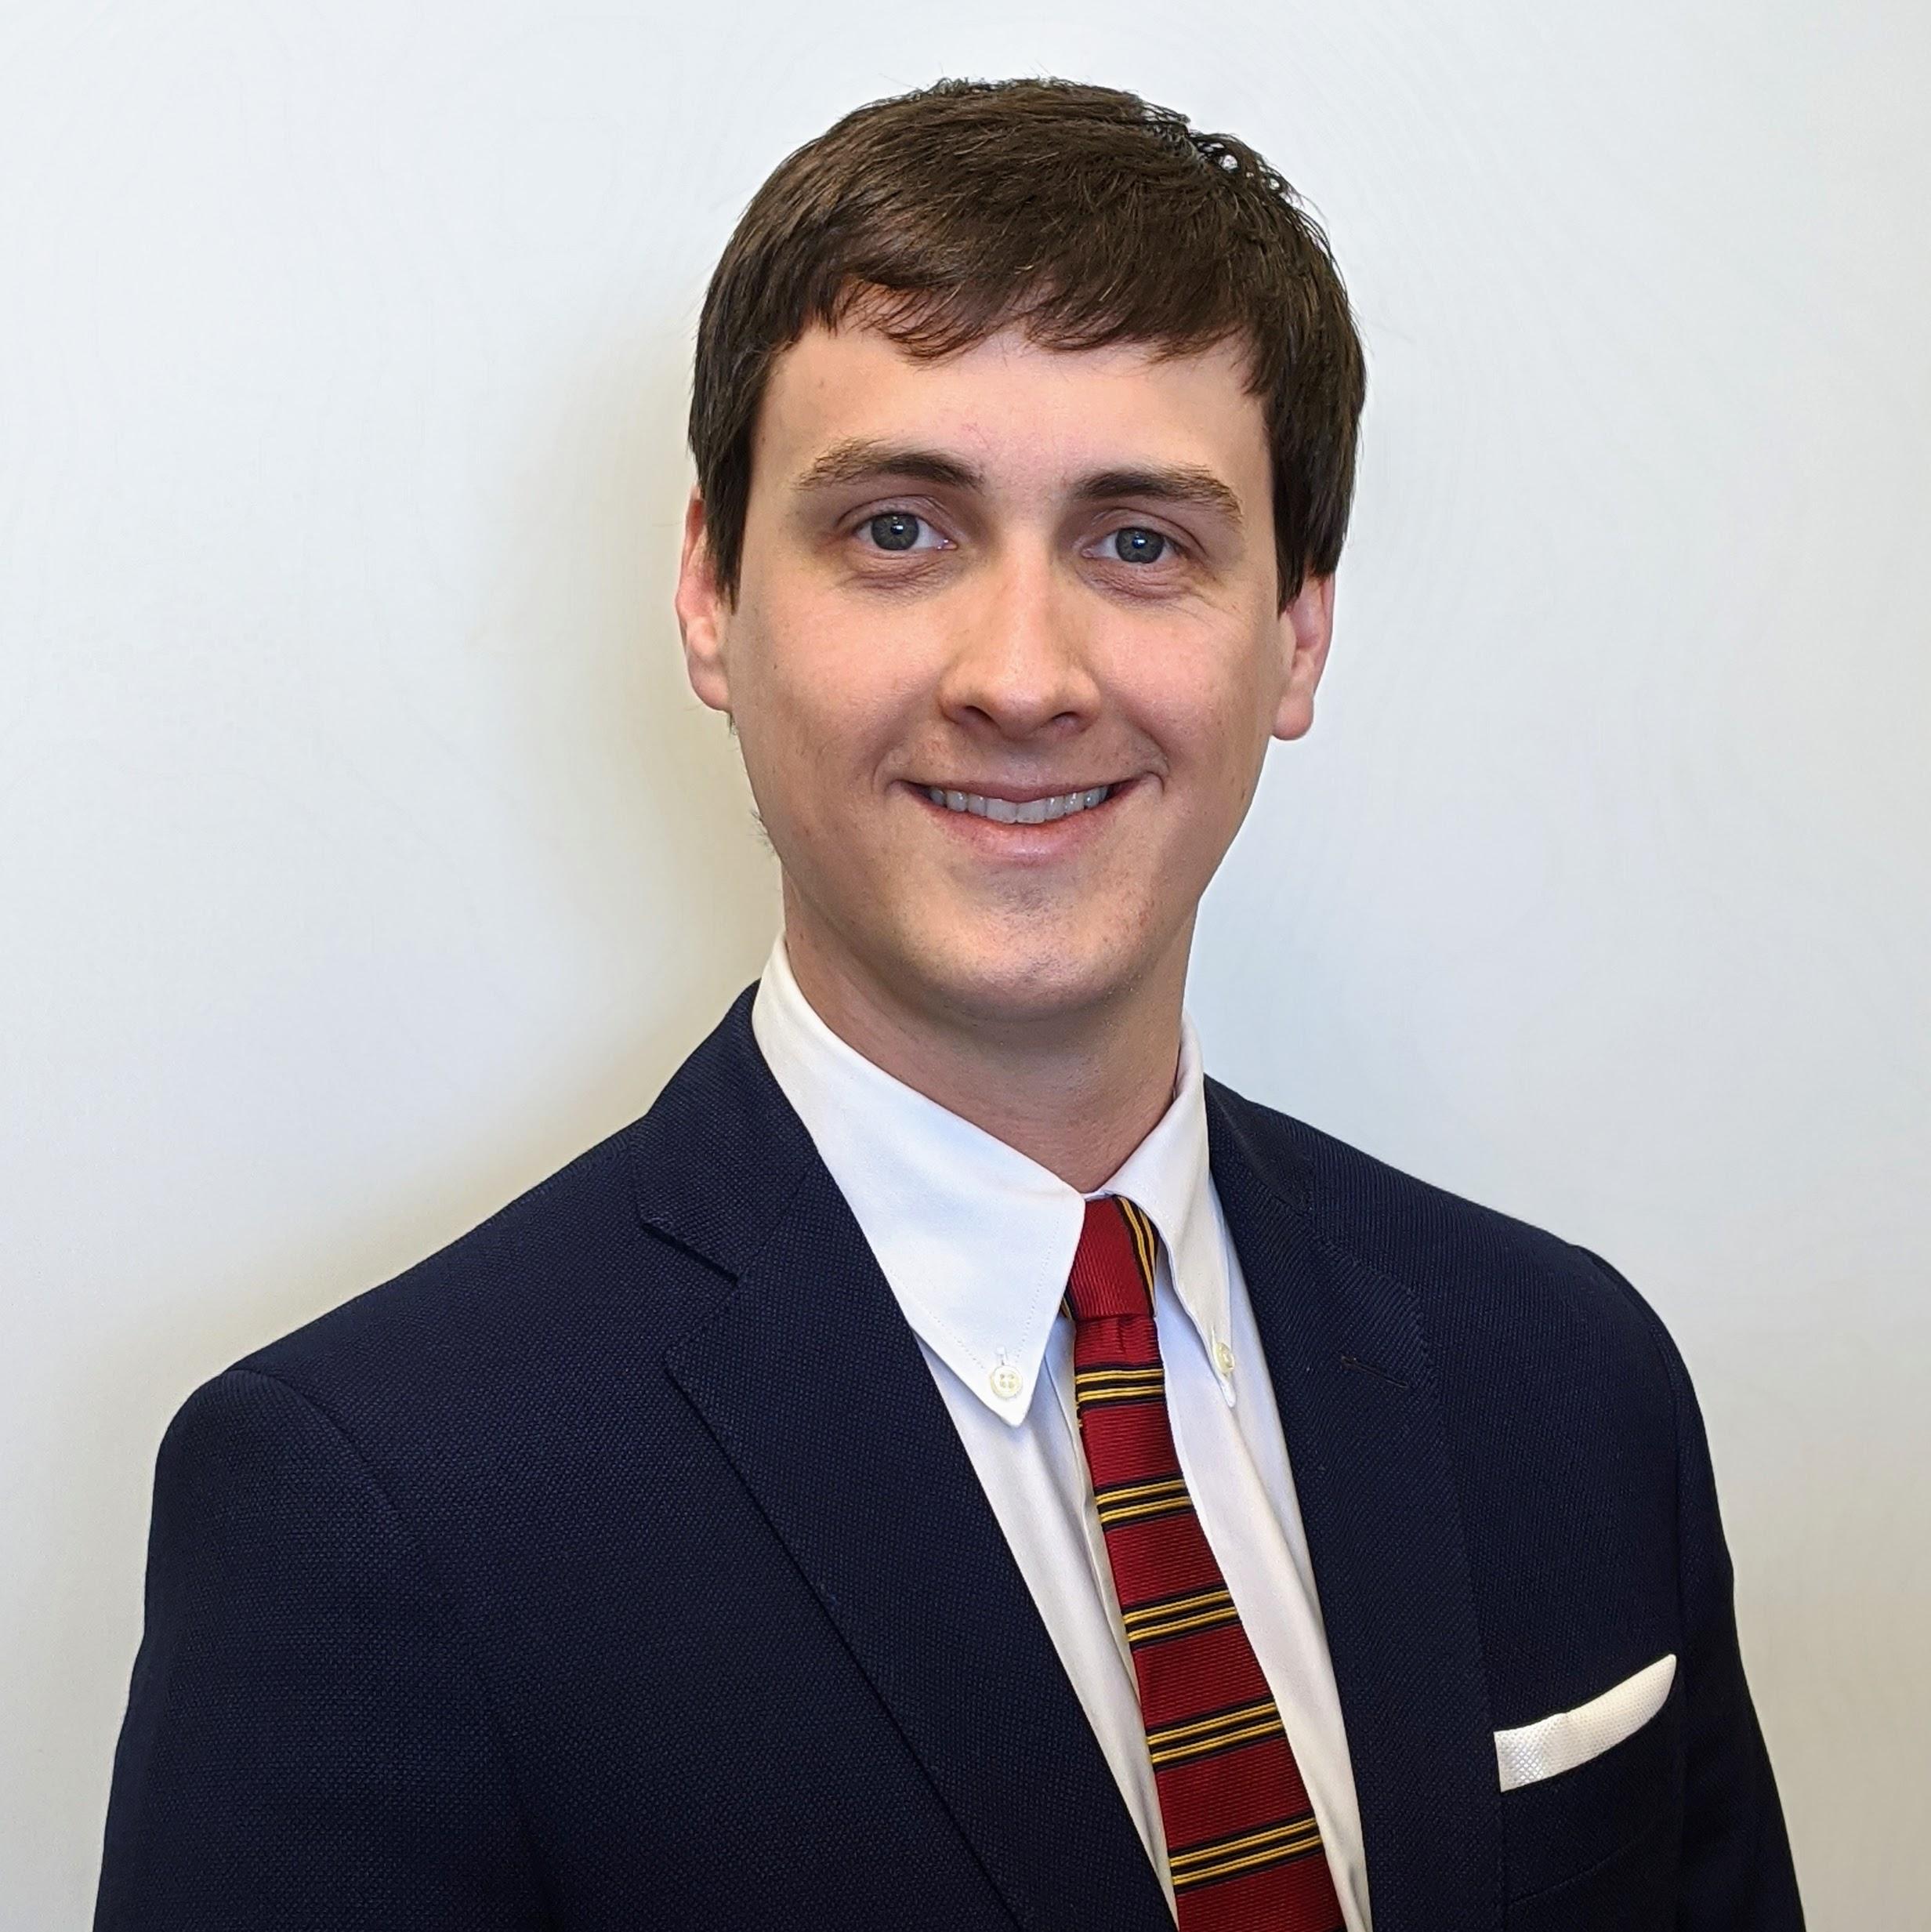 Photograph of Brady Mosher, M.D.